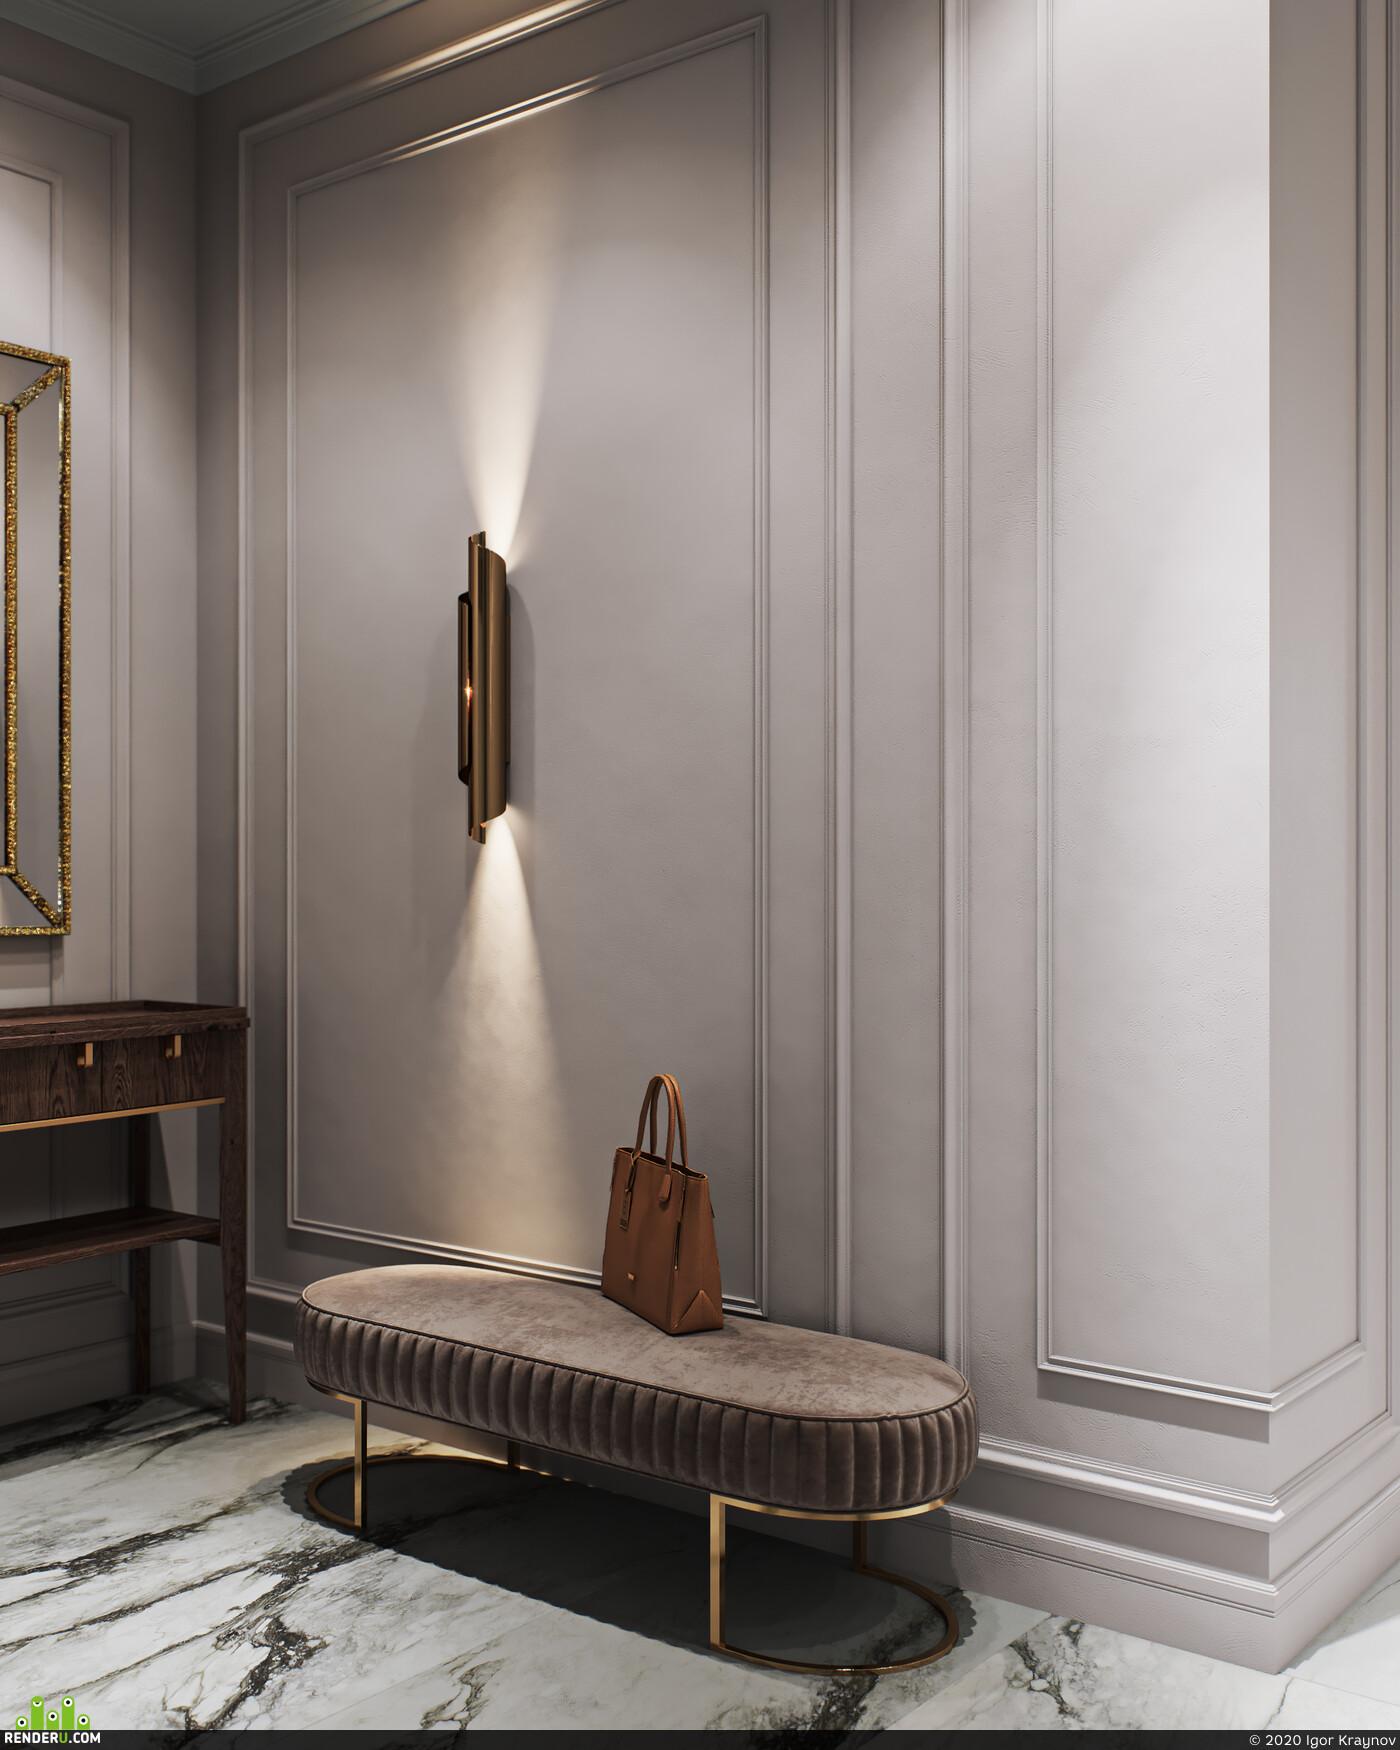 visualization, interior design, interior, coronarender, Corona Renderer, cgi, neoclassic